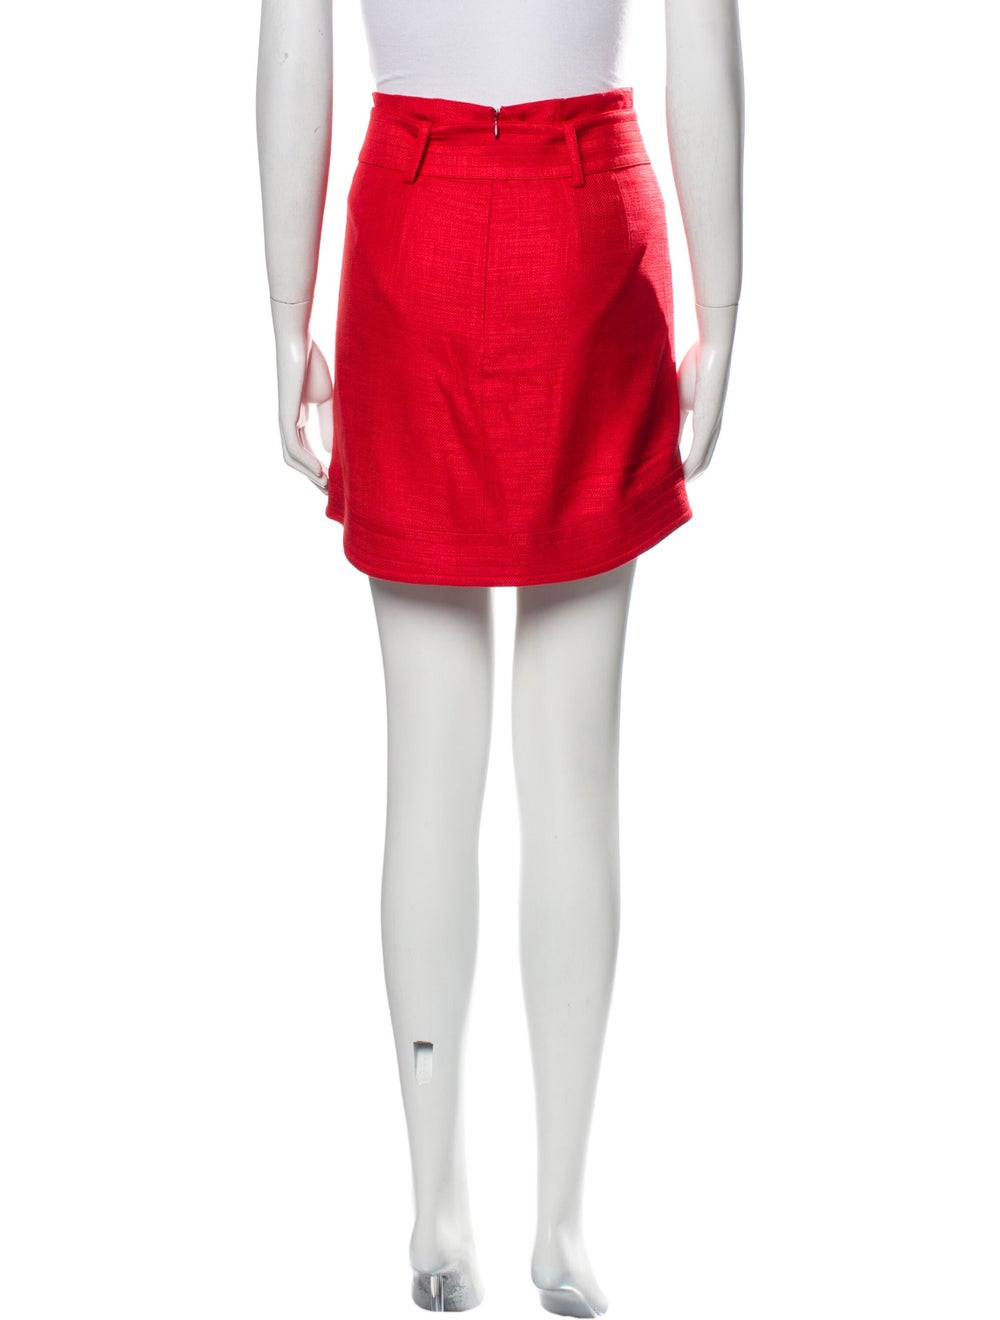 Veronica Beard Mini Skirt Red - image 2